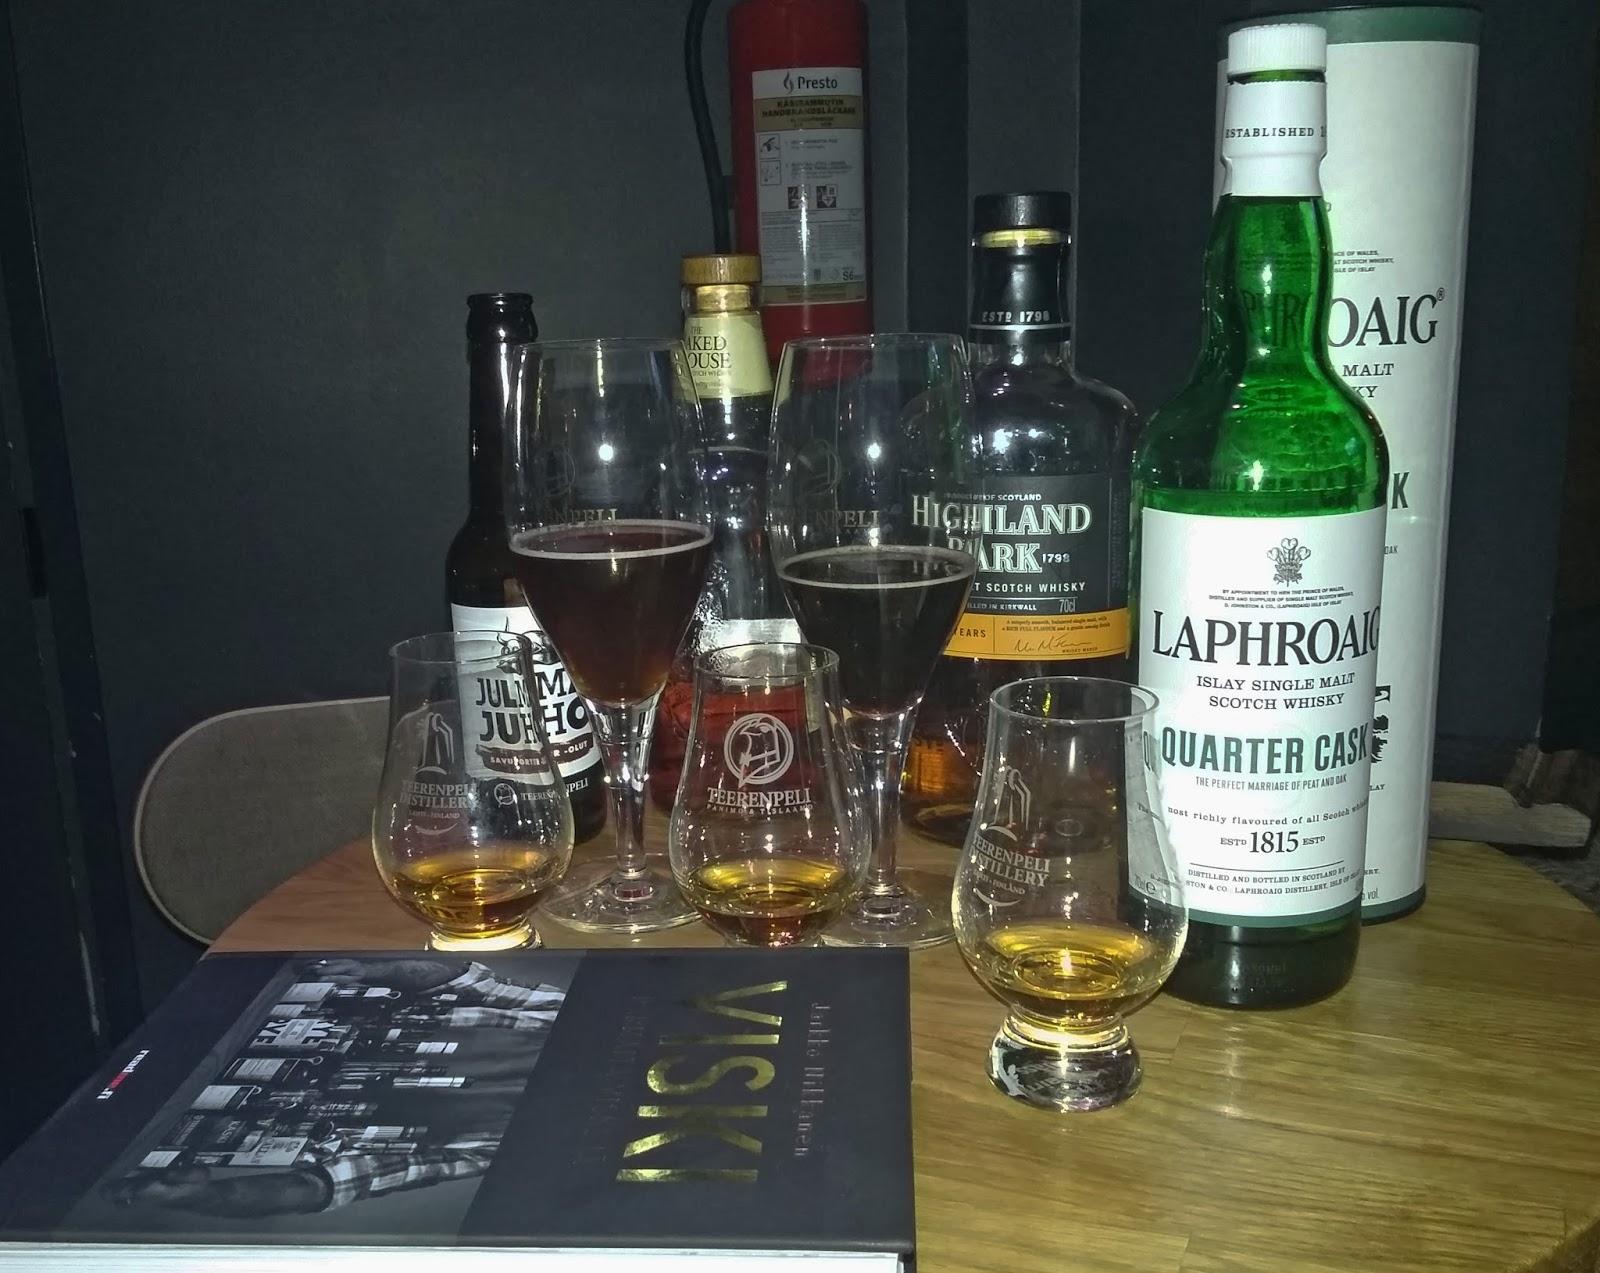 viski joulukalenteri 2018 Viiniblogi/olutblogi Loppasuut: Viski  ja oluttasting  viski joulukalenteri 2018